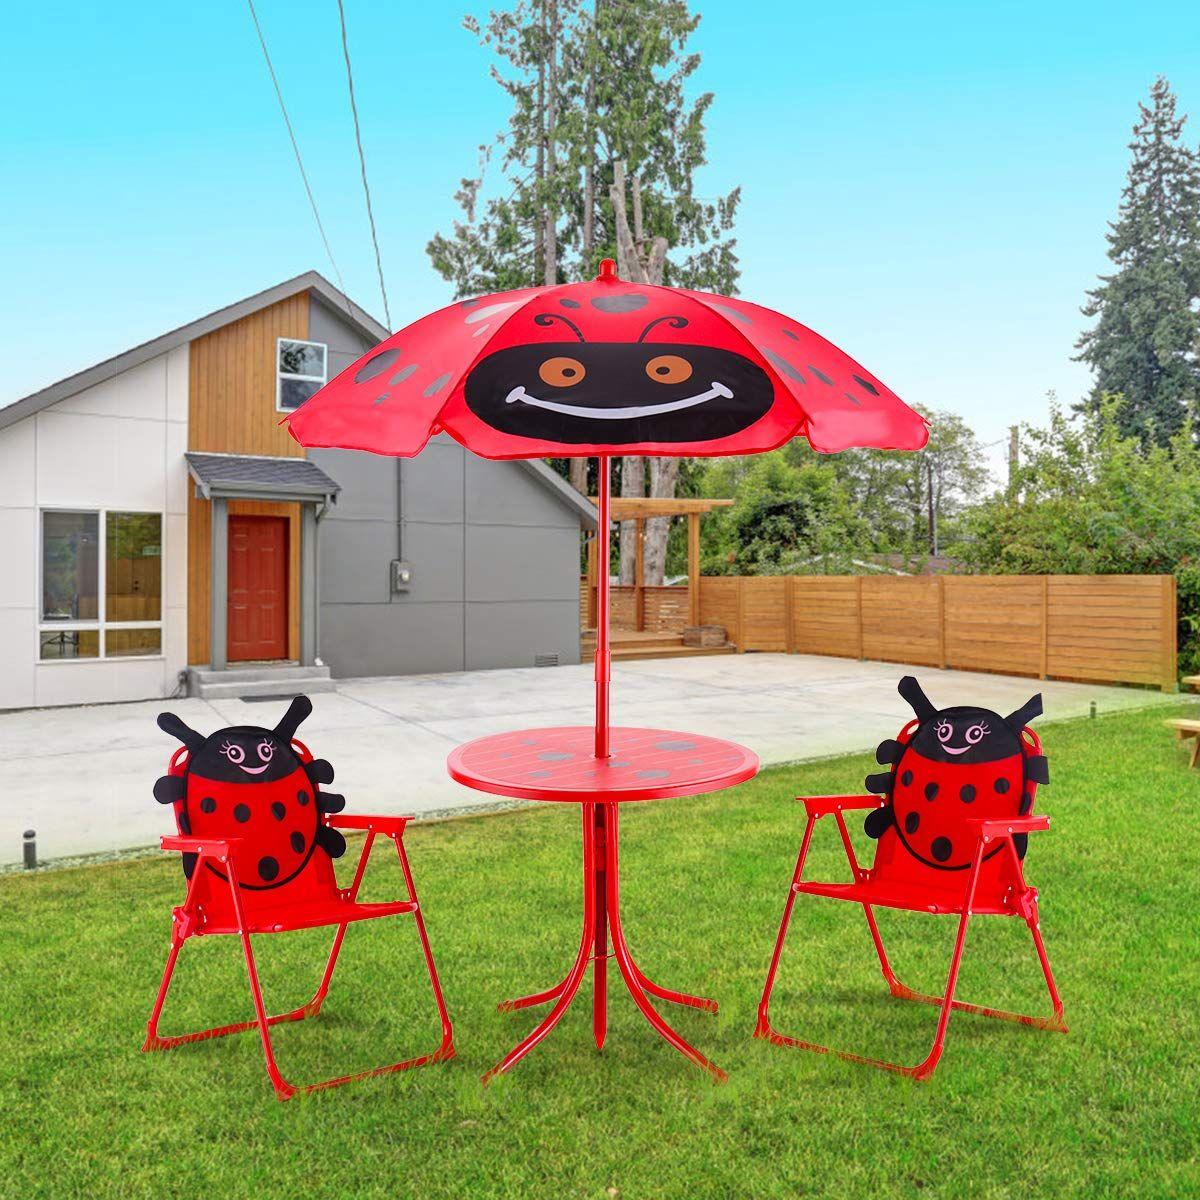 Sitzgruppe Sitzgarnitur Gartengarnitur Kindermobel Kindertisch Inkl Sonnenschirm 2 Stuhle Rot Kinder Mobel Sonnenschirm Kindertisch